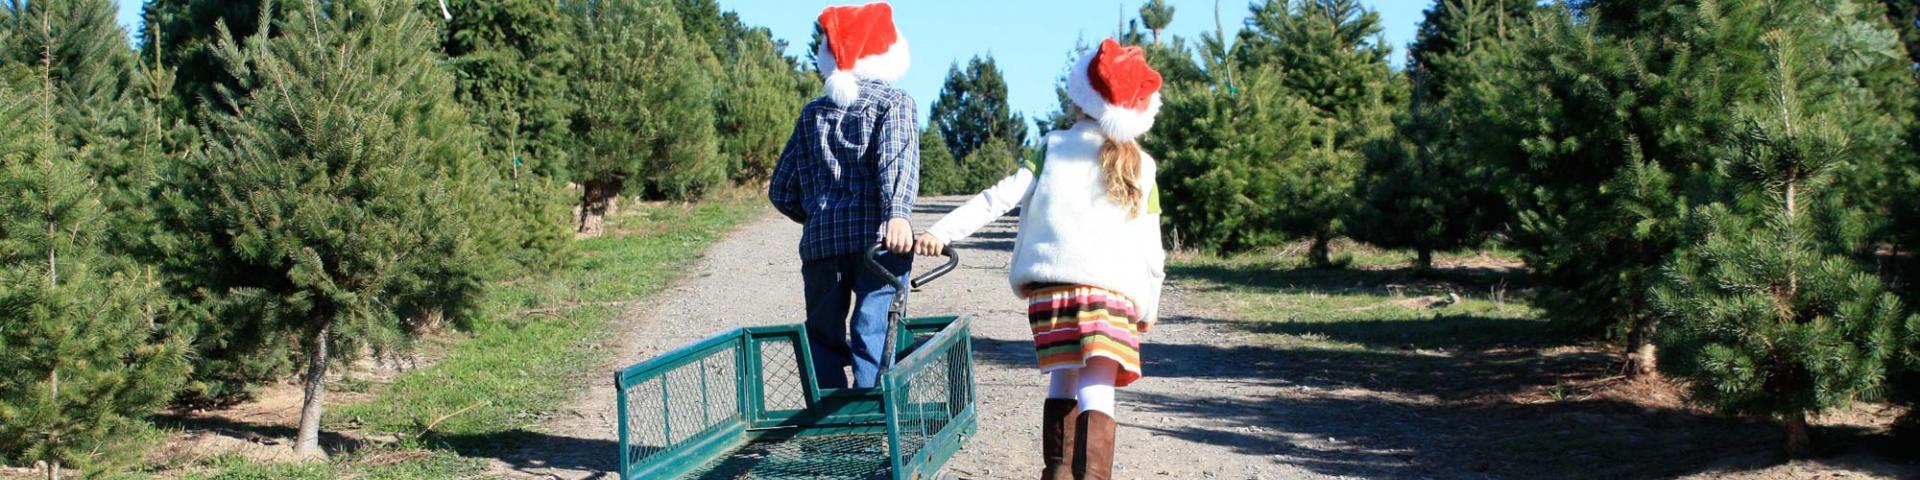 Marin Holiday Guide - kids at Christmas Tree Farm